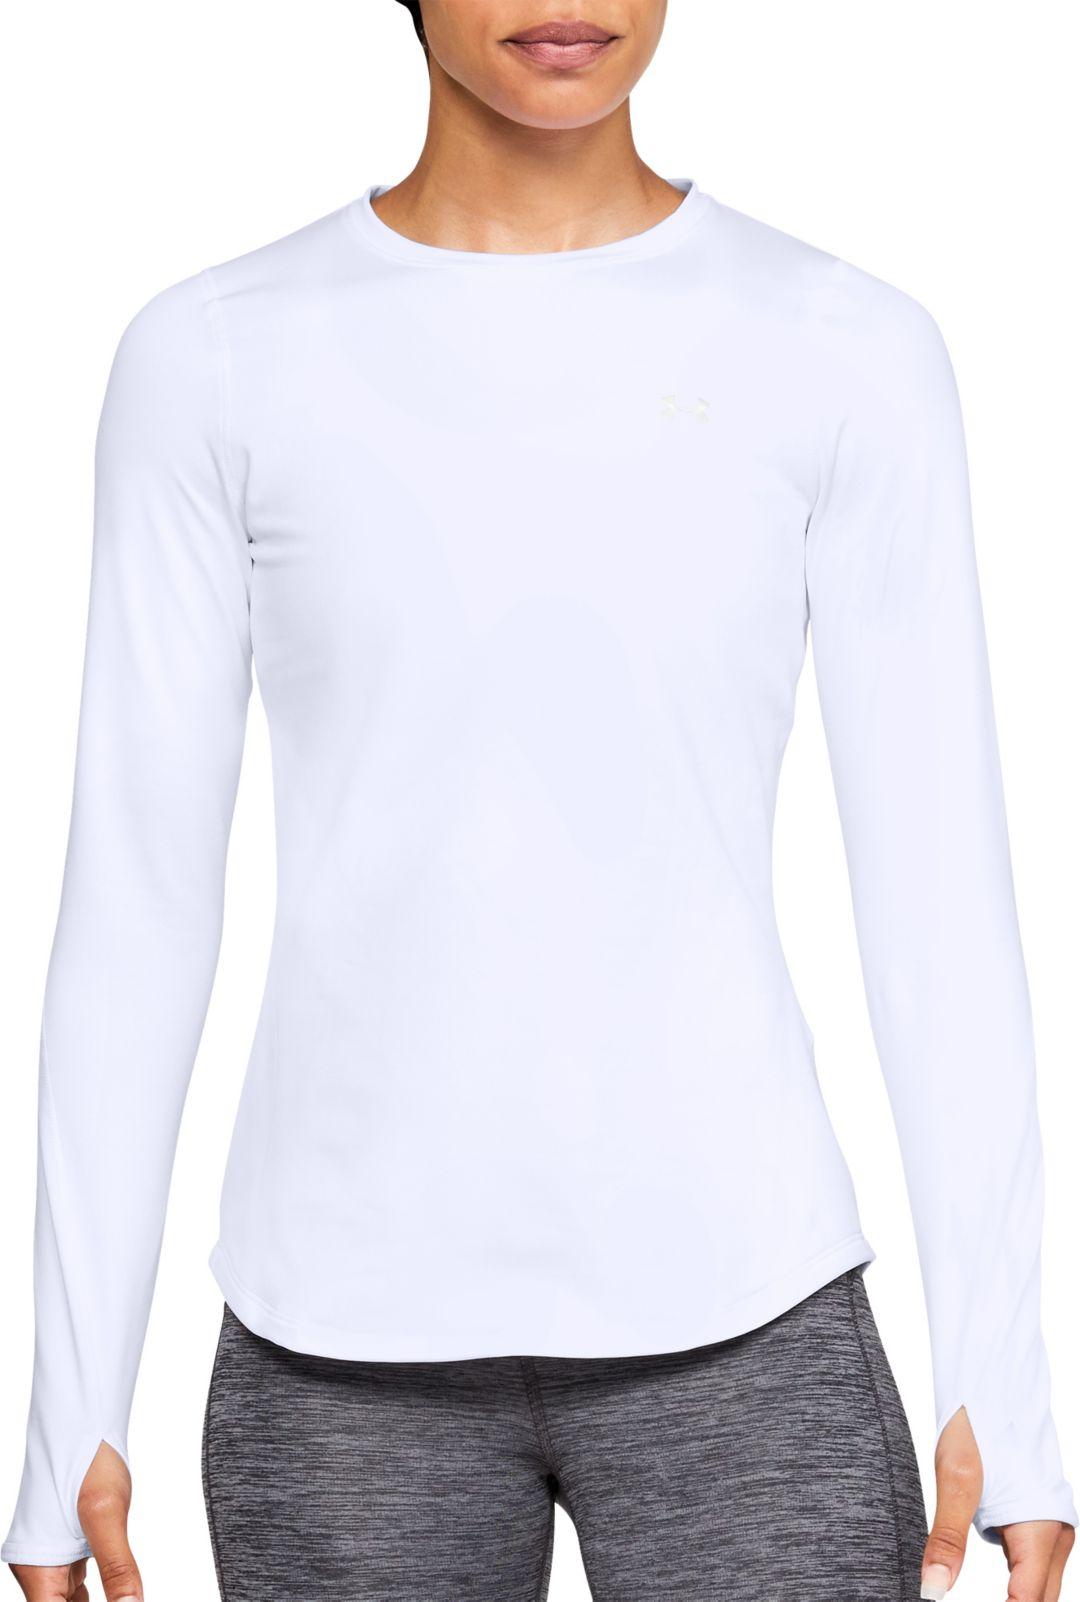 a254e81247 Under Armour Women's ColdGear Armour Crew Long Sleeve Shirt